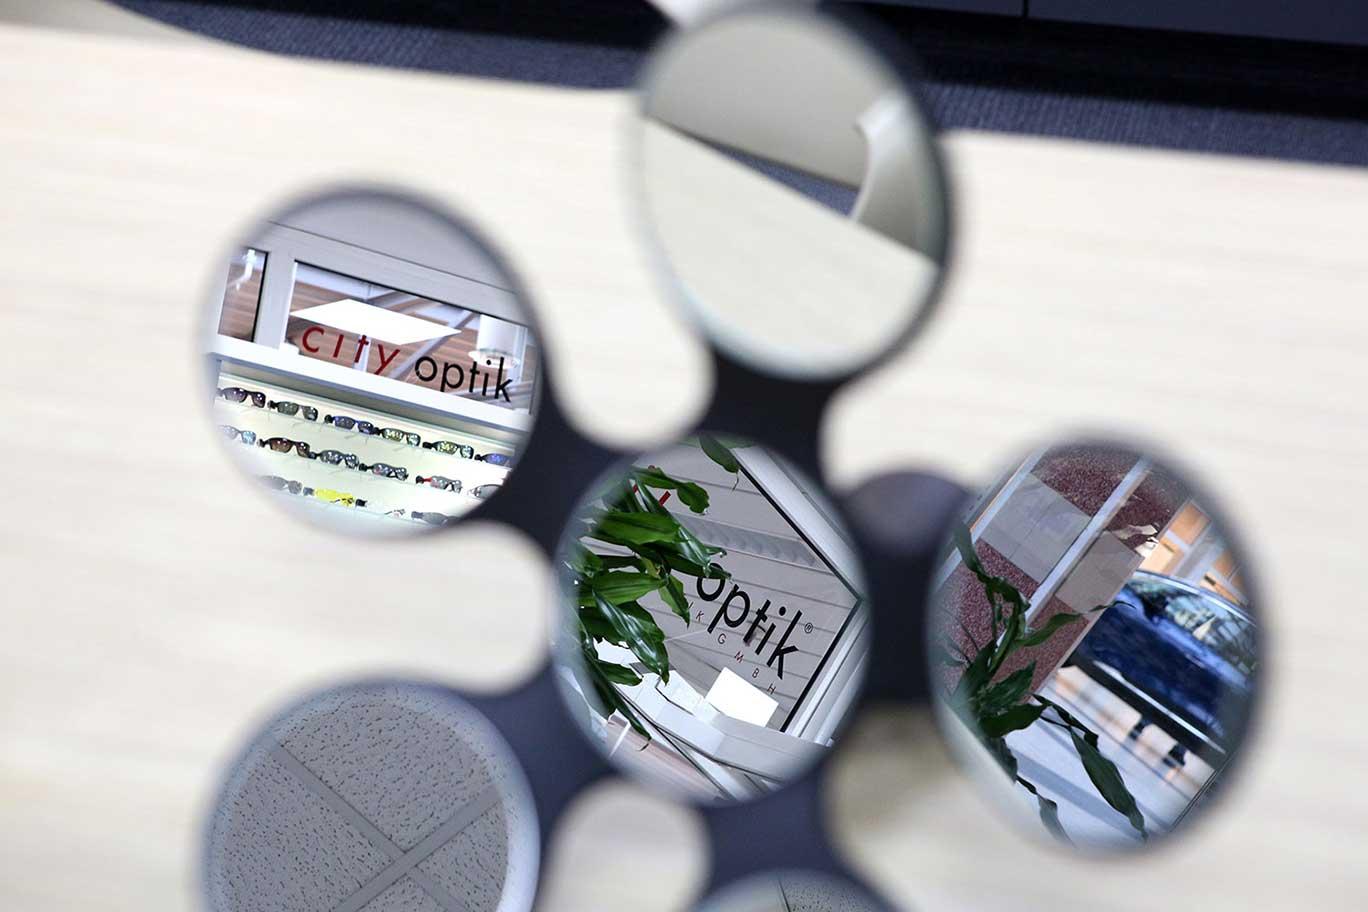 city optik bild - City Optik